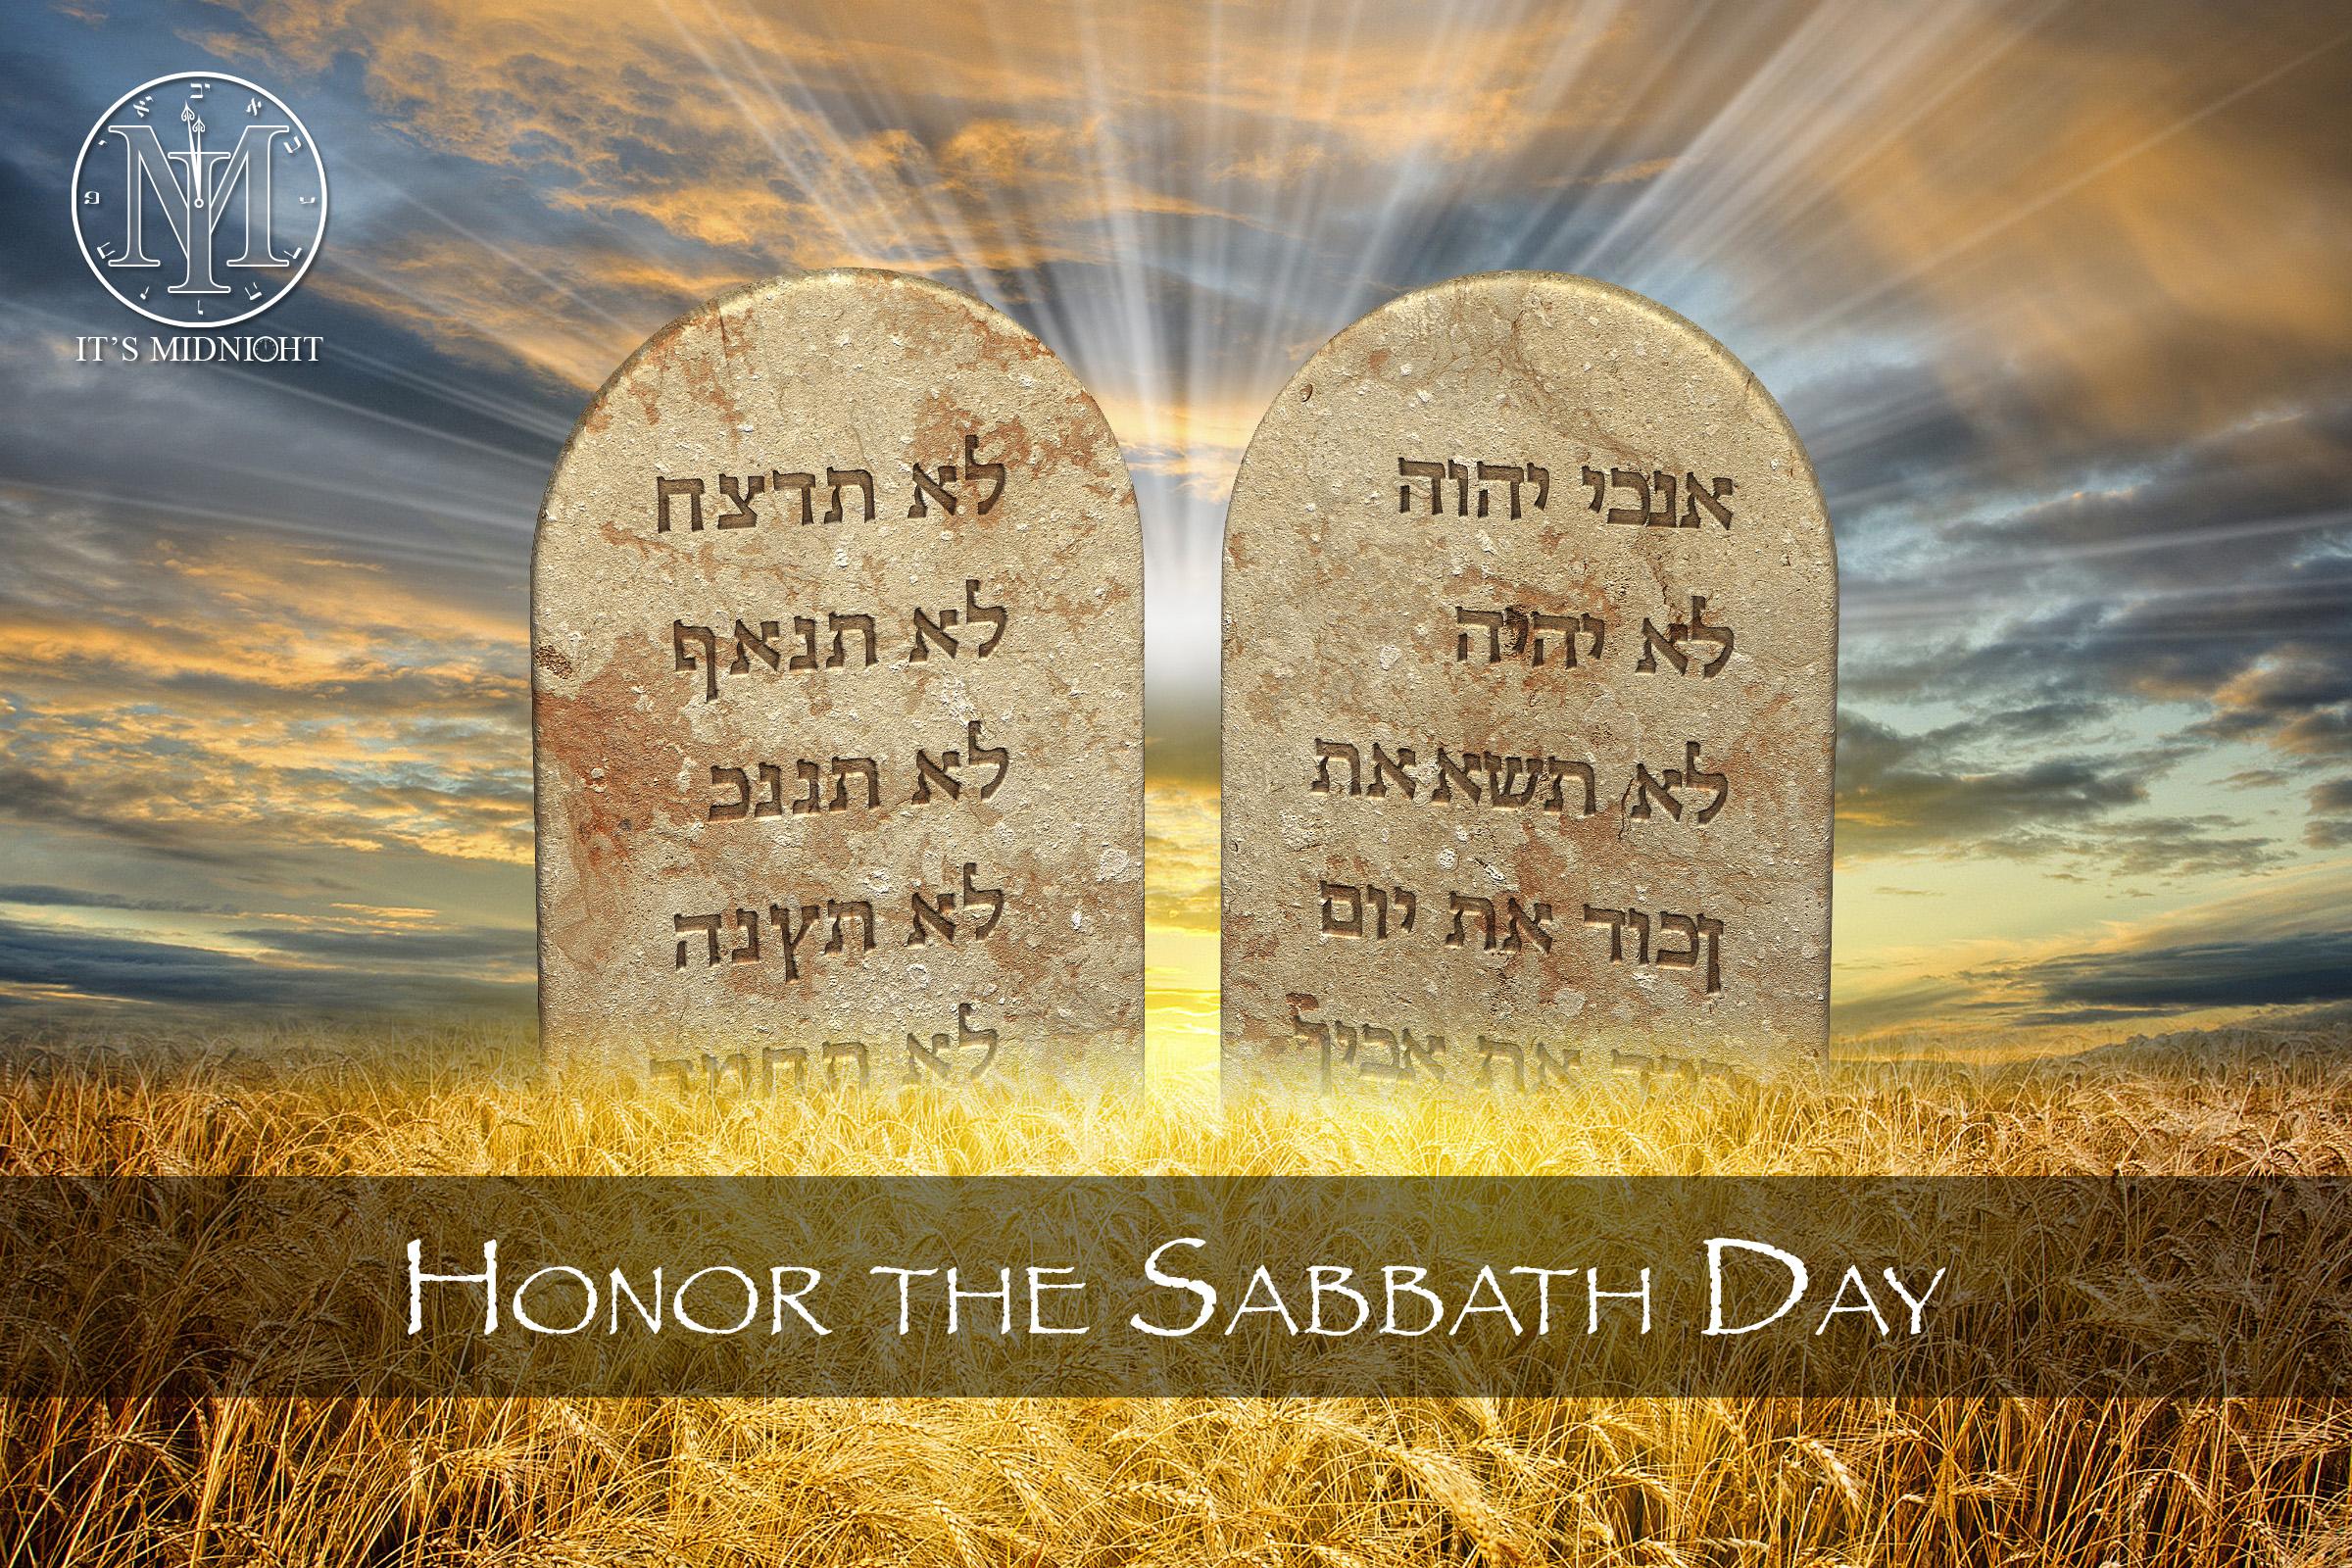 The 4th Commandment